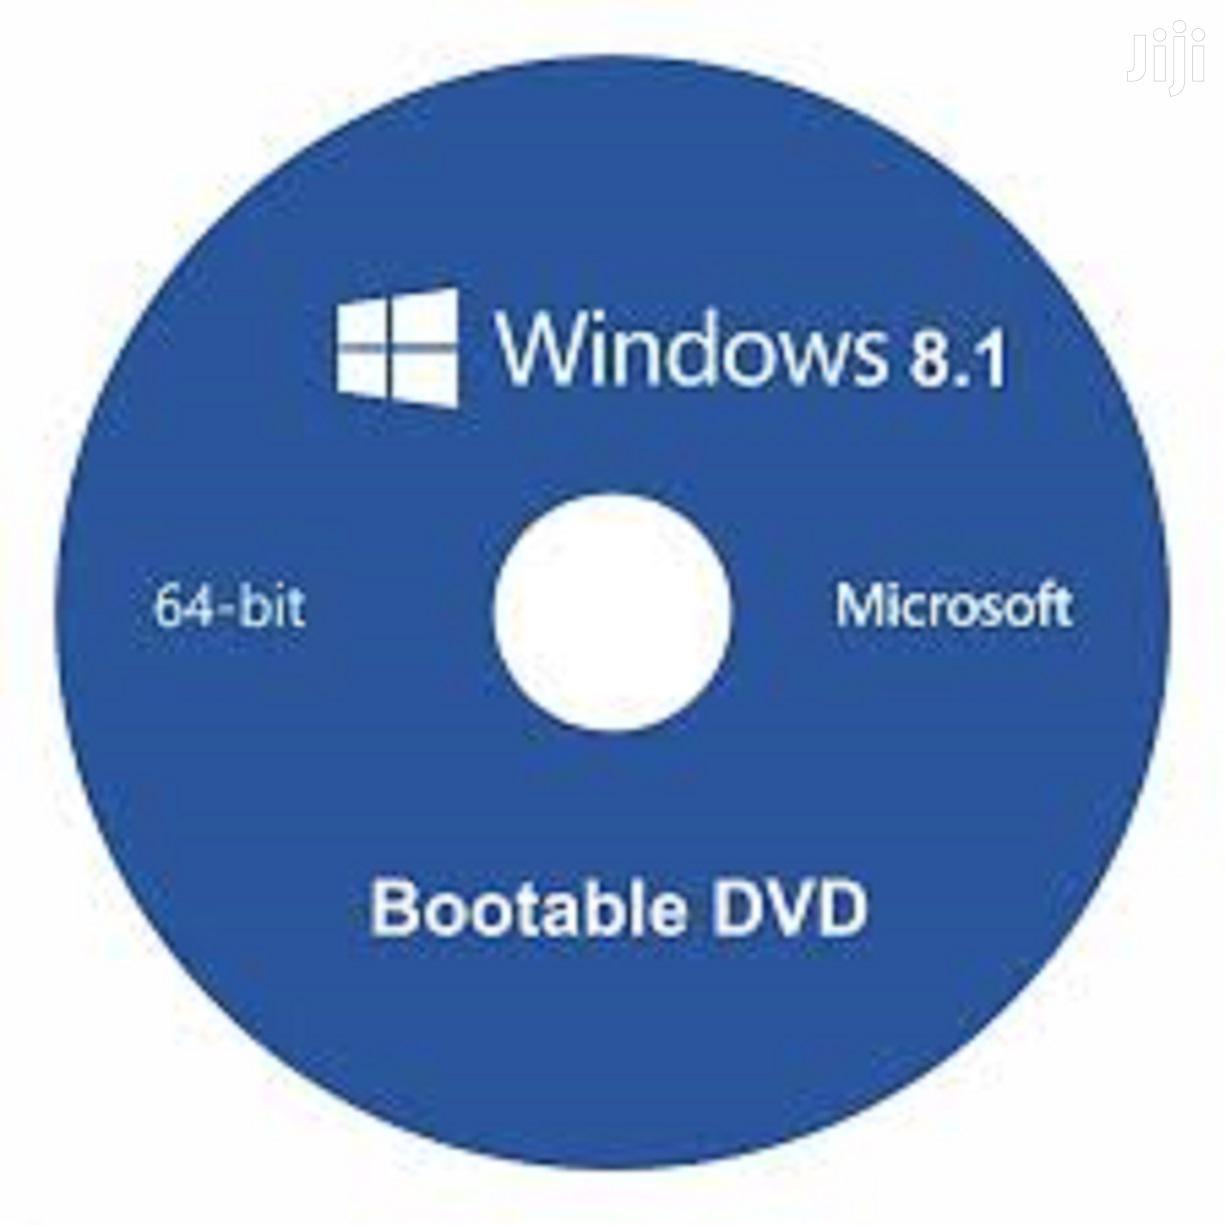 Archive: Windows 8.1